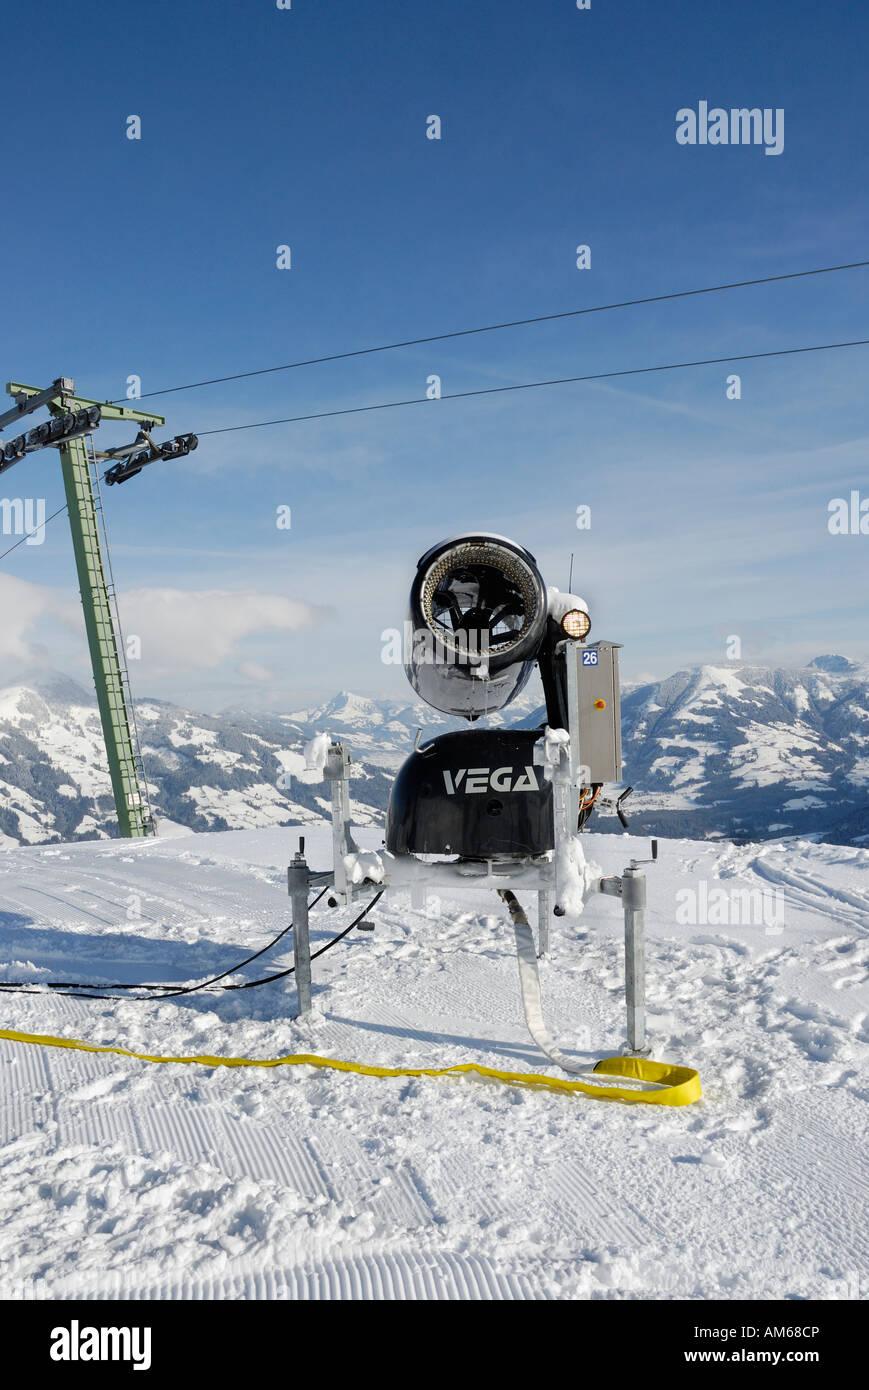 Radio controlled snow machine in Marchbach Joch ski resort, Wildschoenau Austria - Stock Image